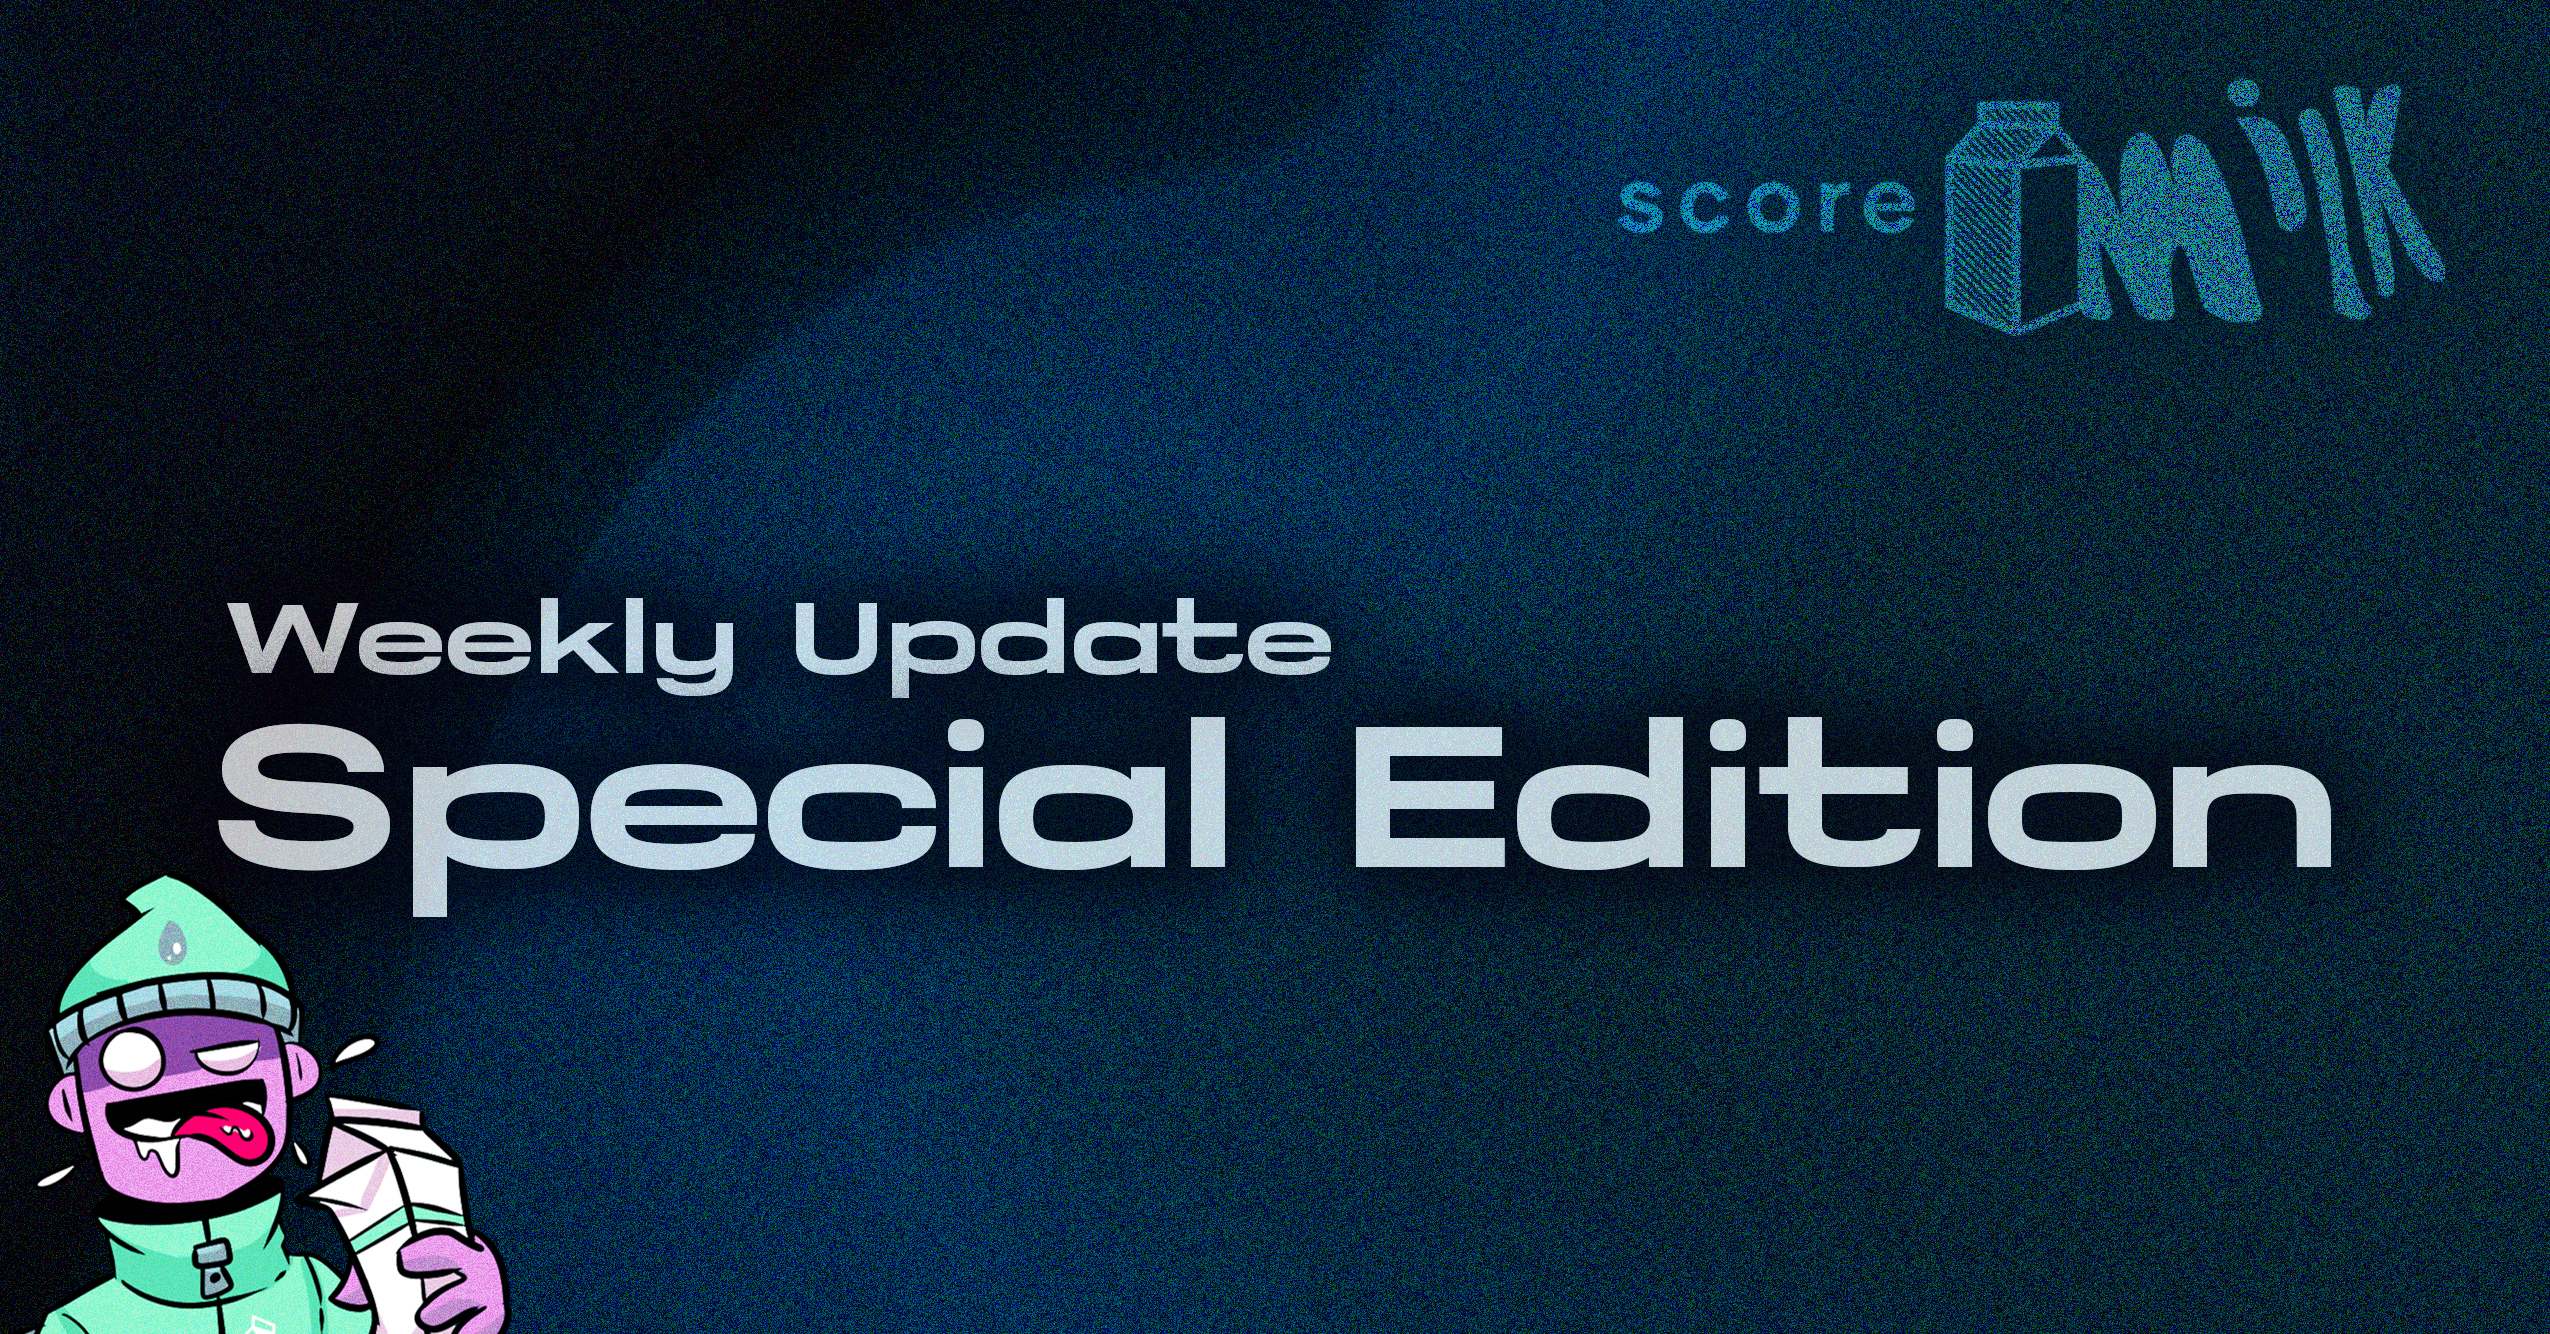 Special Edition Score Milk Update – February 28, 2021